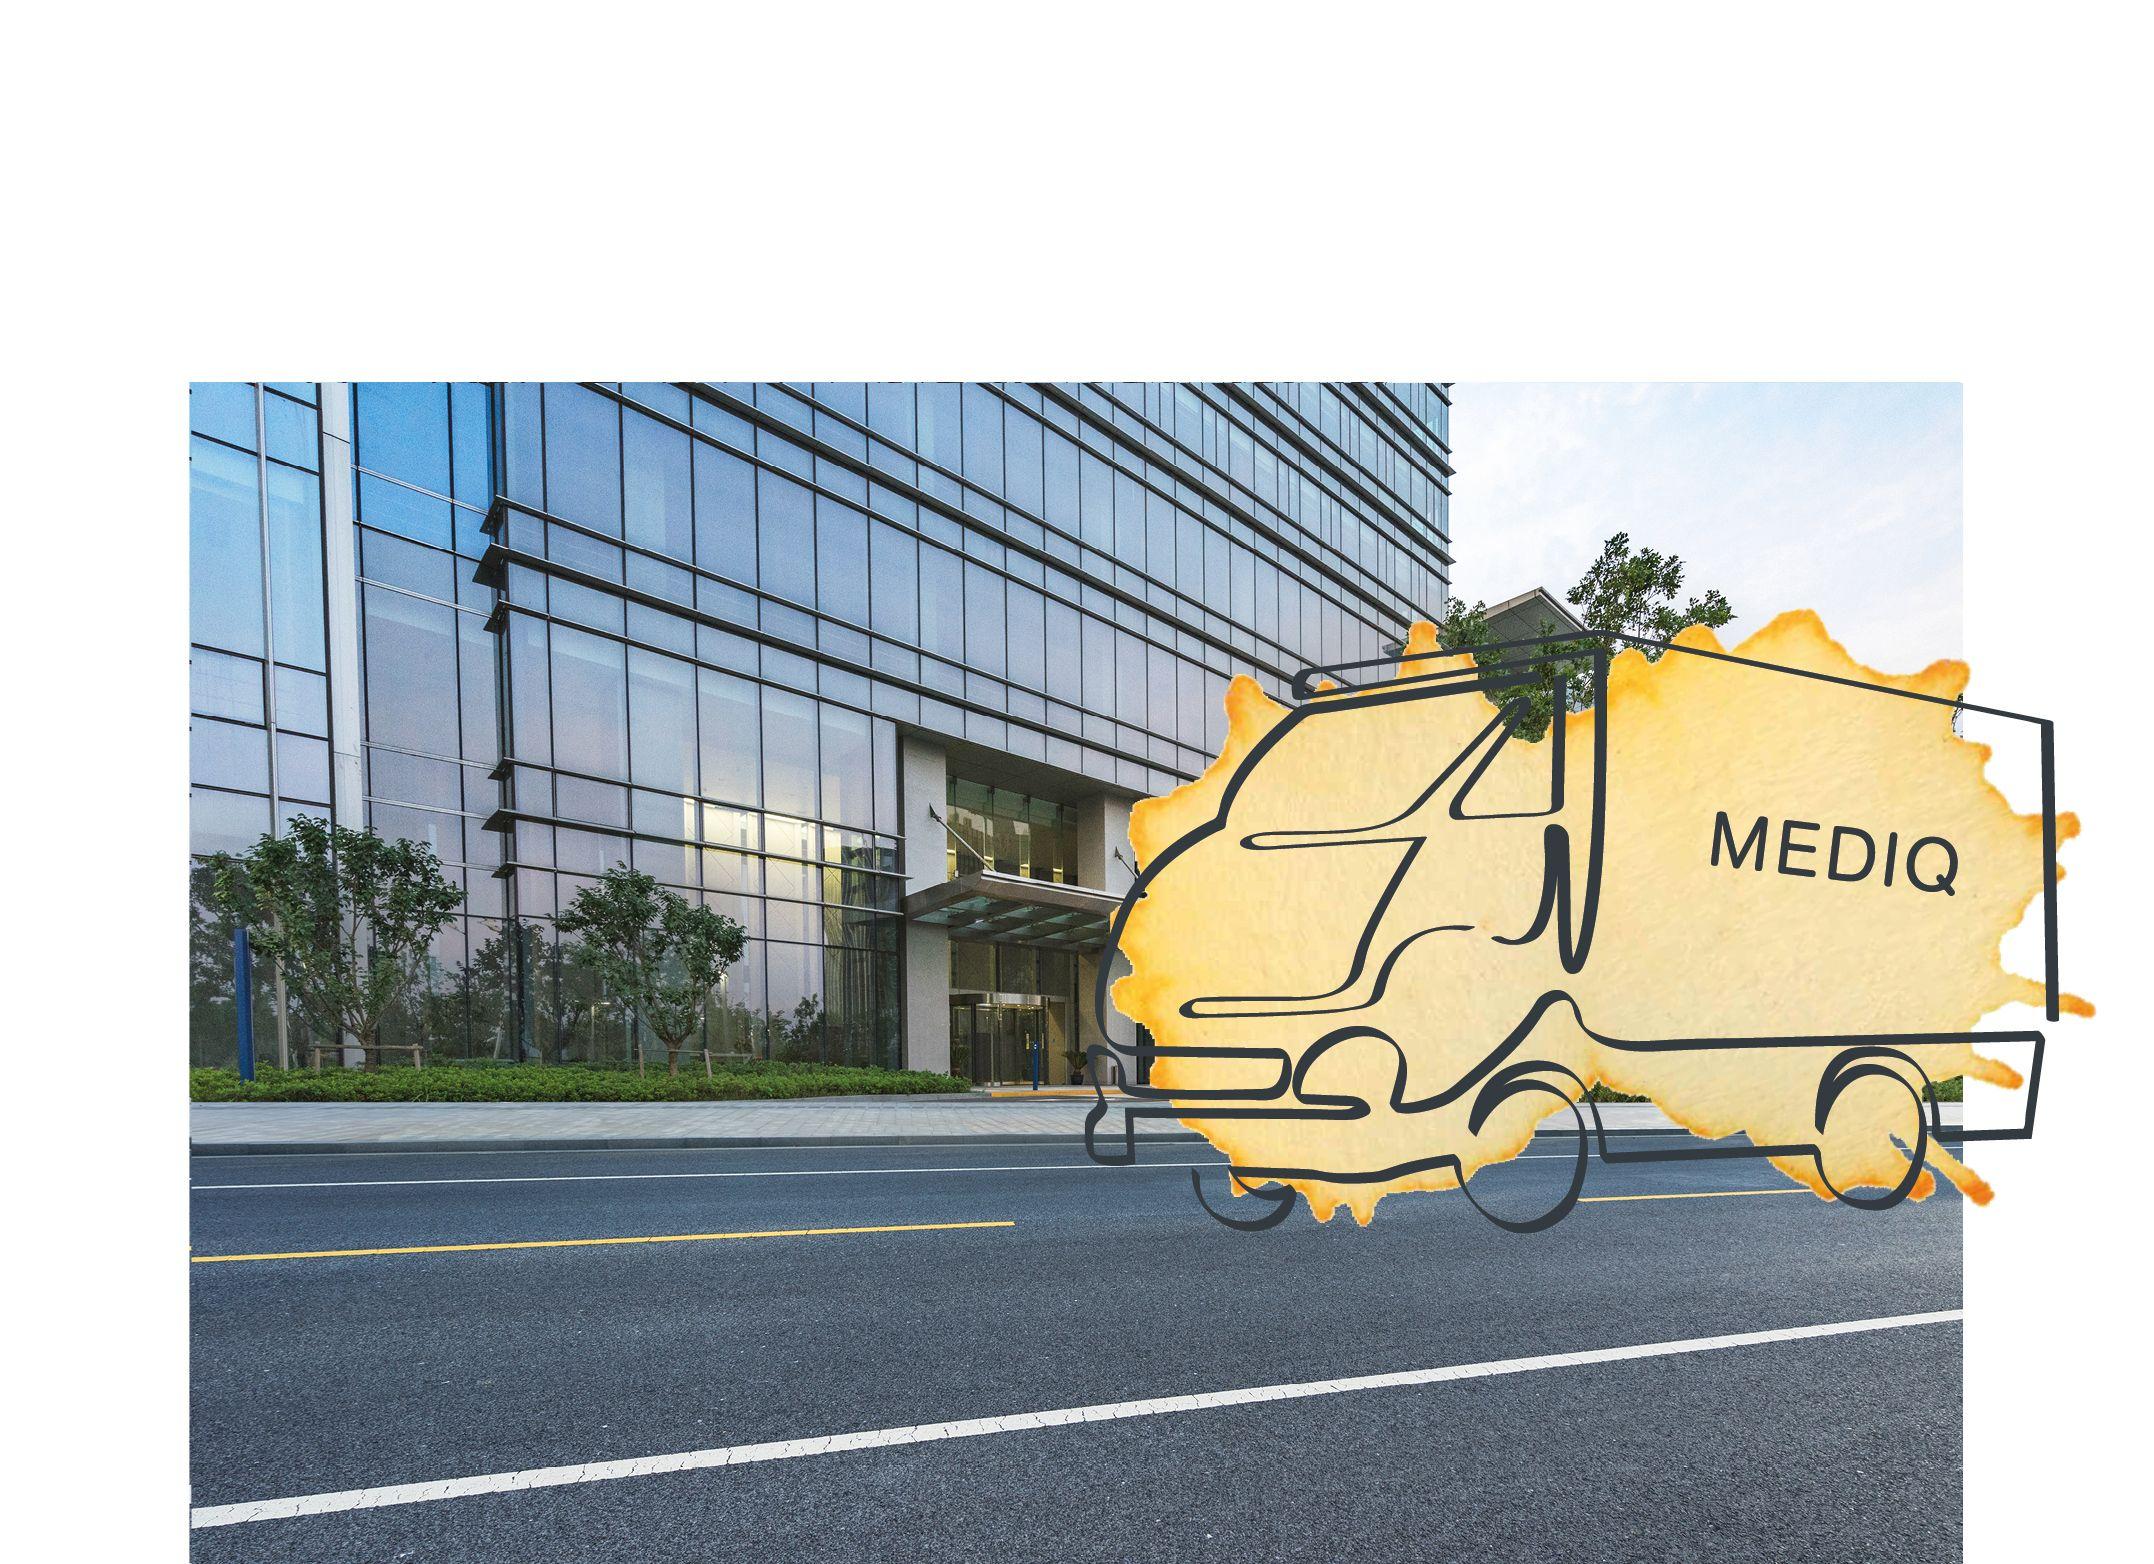 Mediq Medeco – Dienstenportfolio